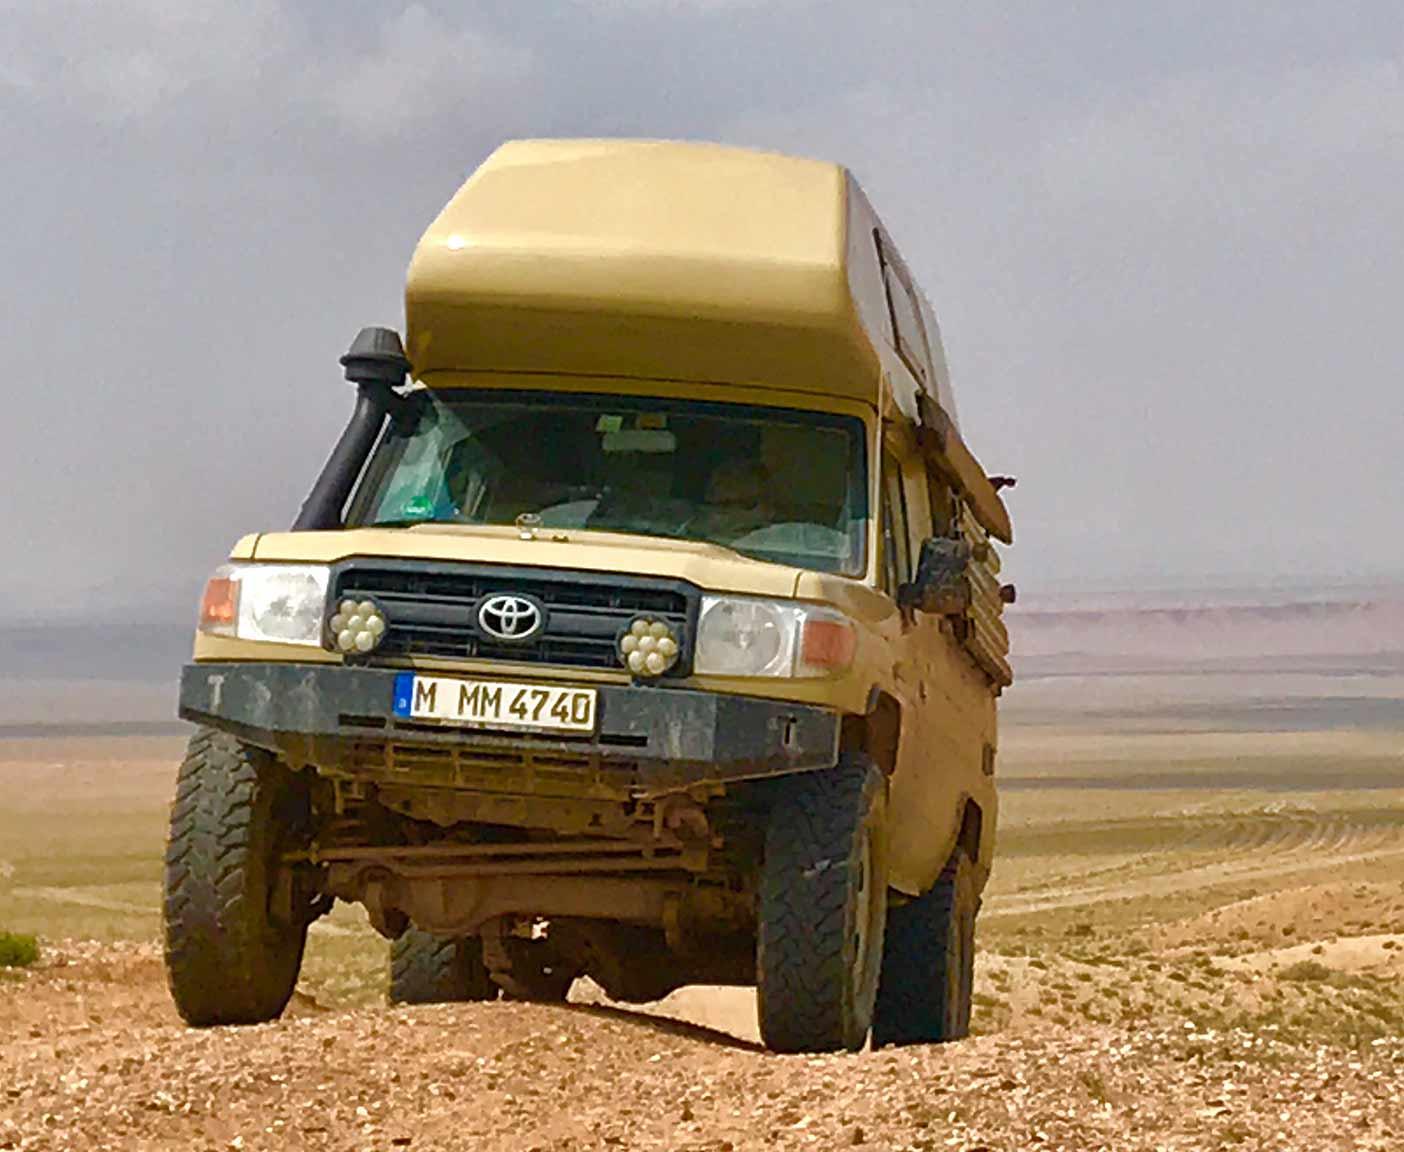 road-trip-maroc-maghreb-desert-sahara-4x4-vanlife